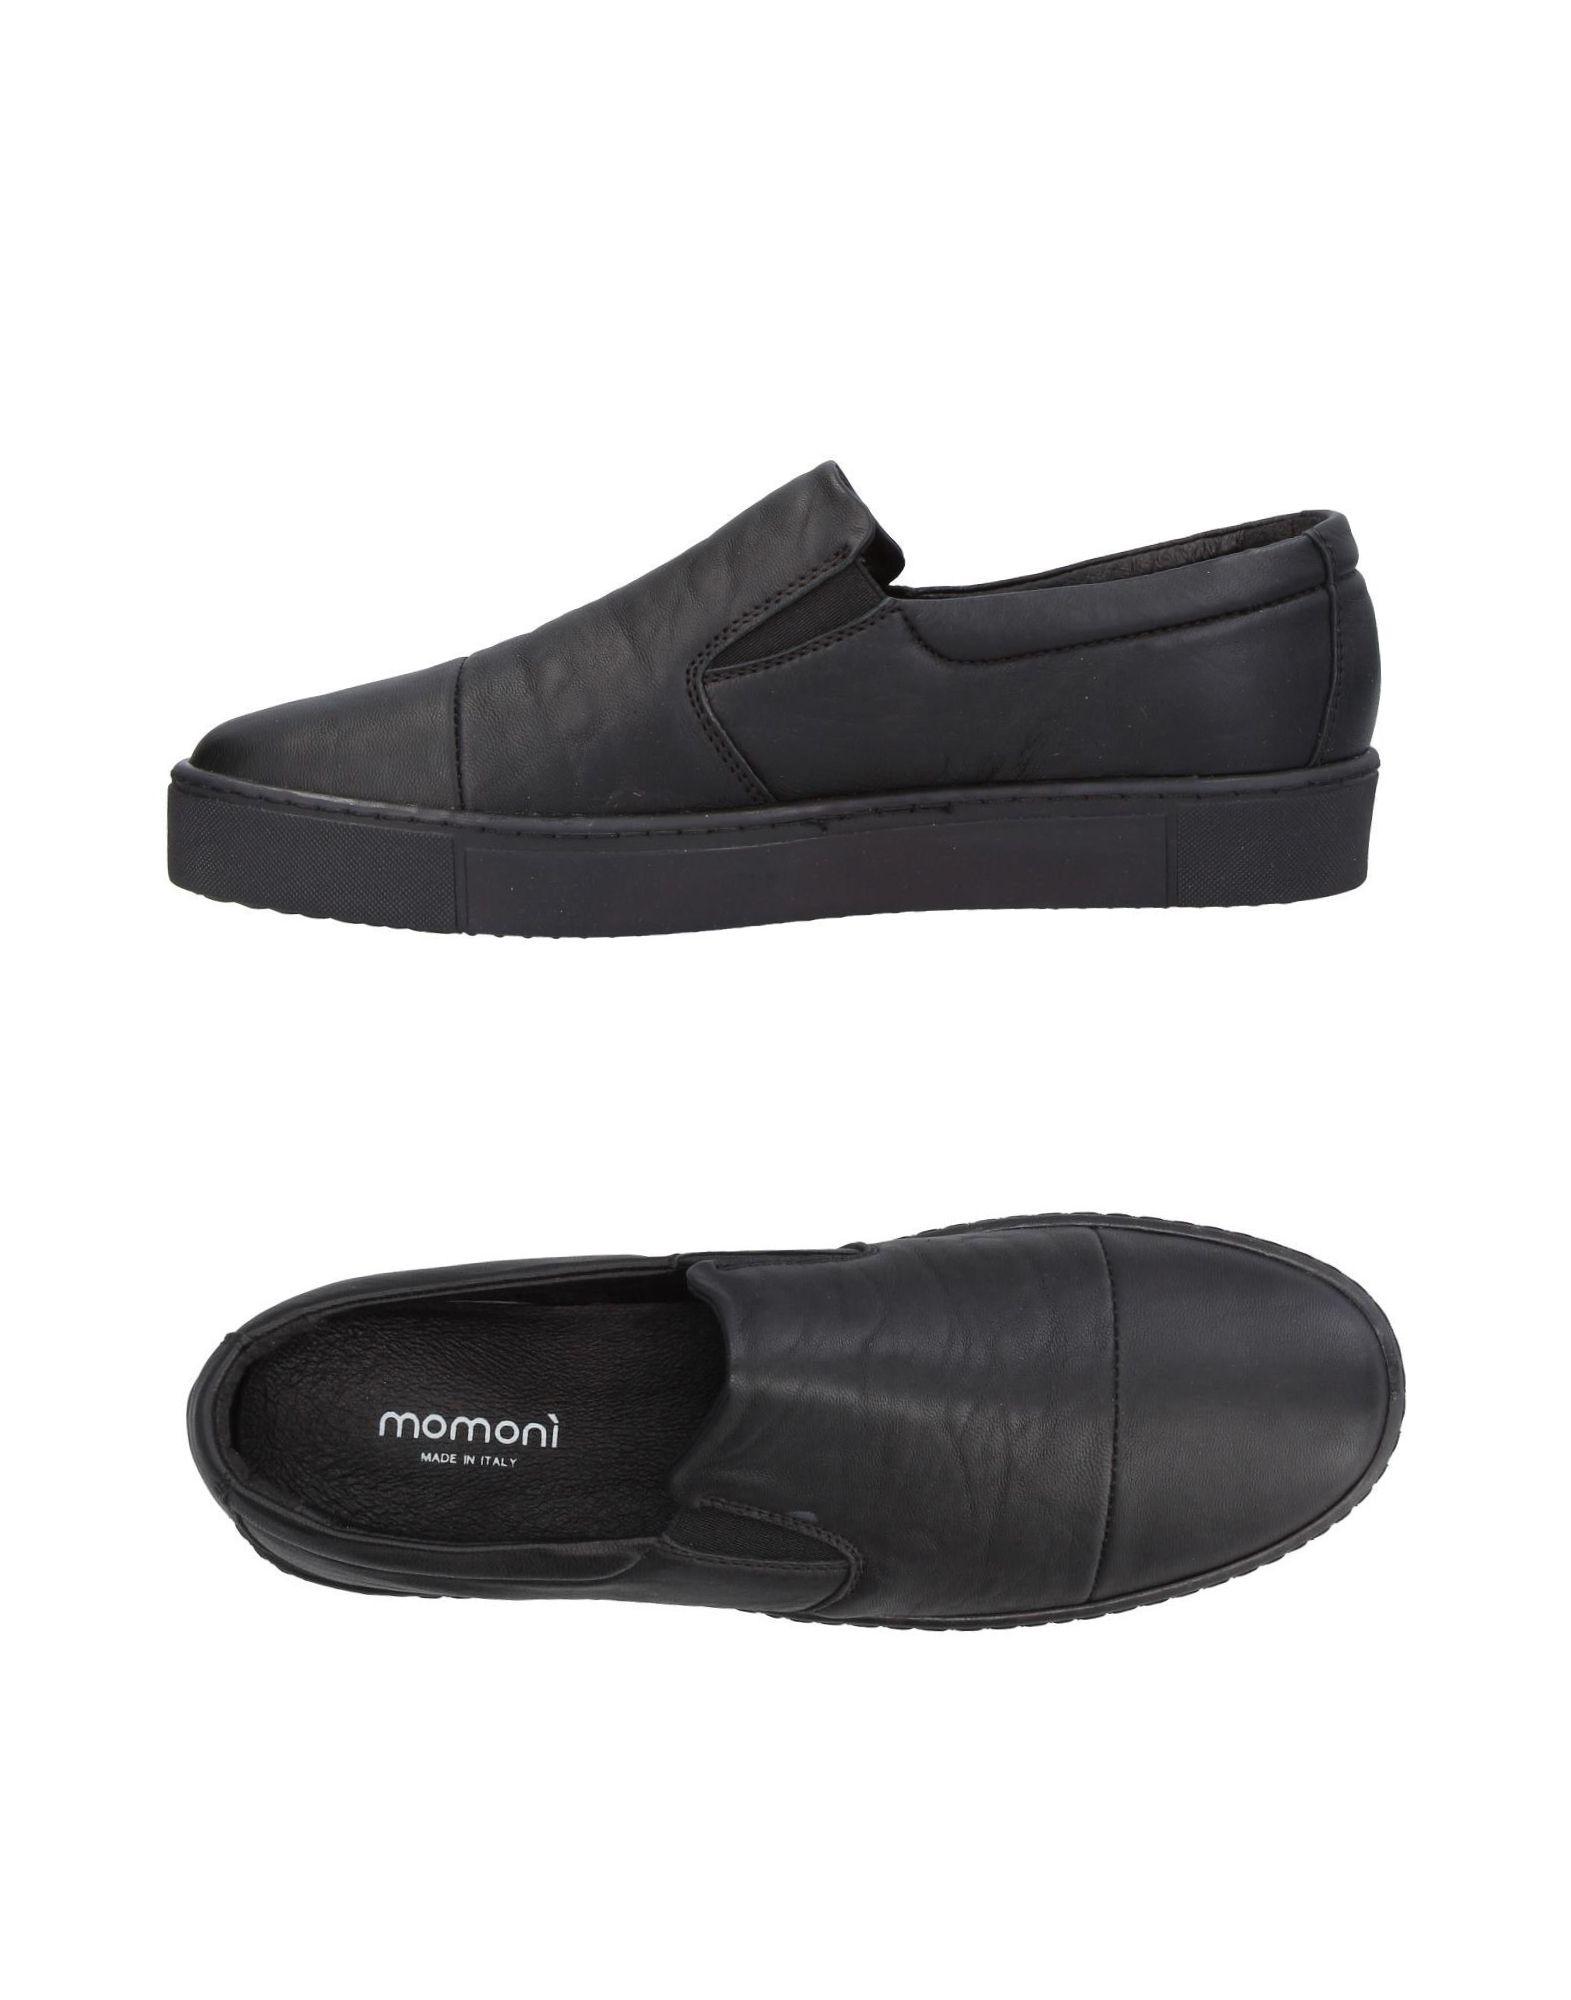 A buon mercato Sneakers Momoní Donna - 11414129UO